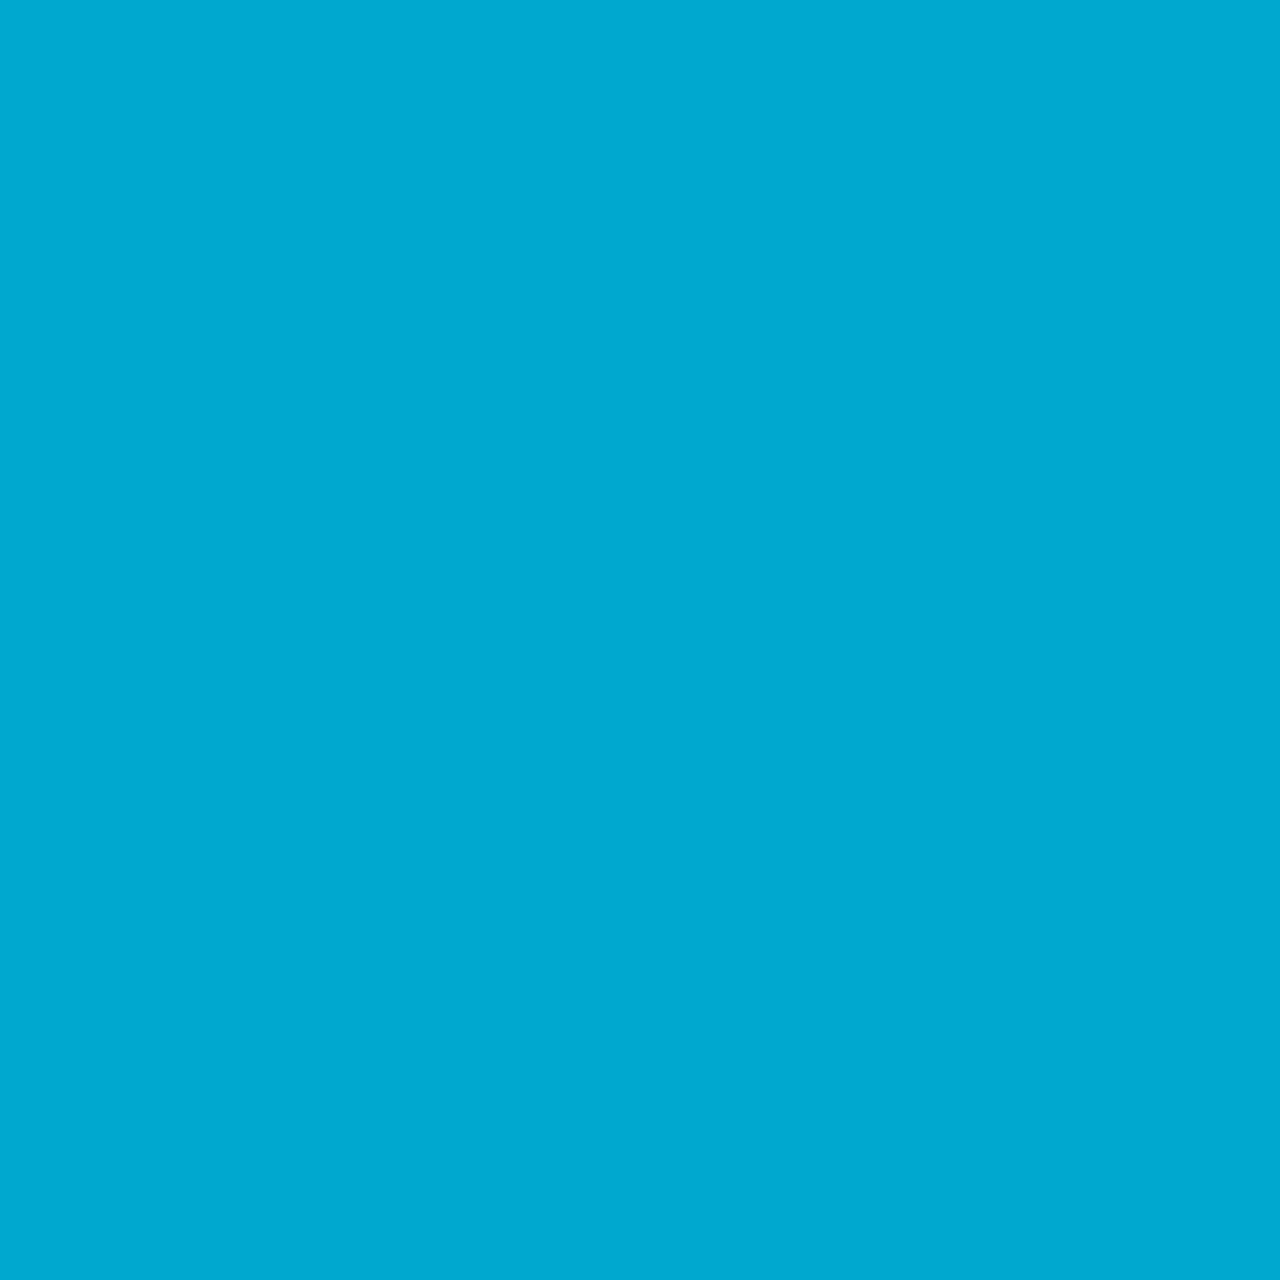 "#0375 Rosco Gels Roscolux Cerulean Blue, 20x24"""